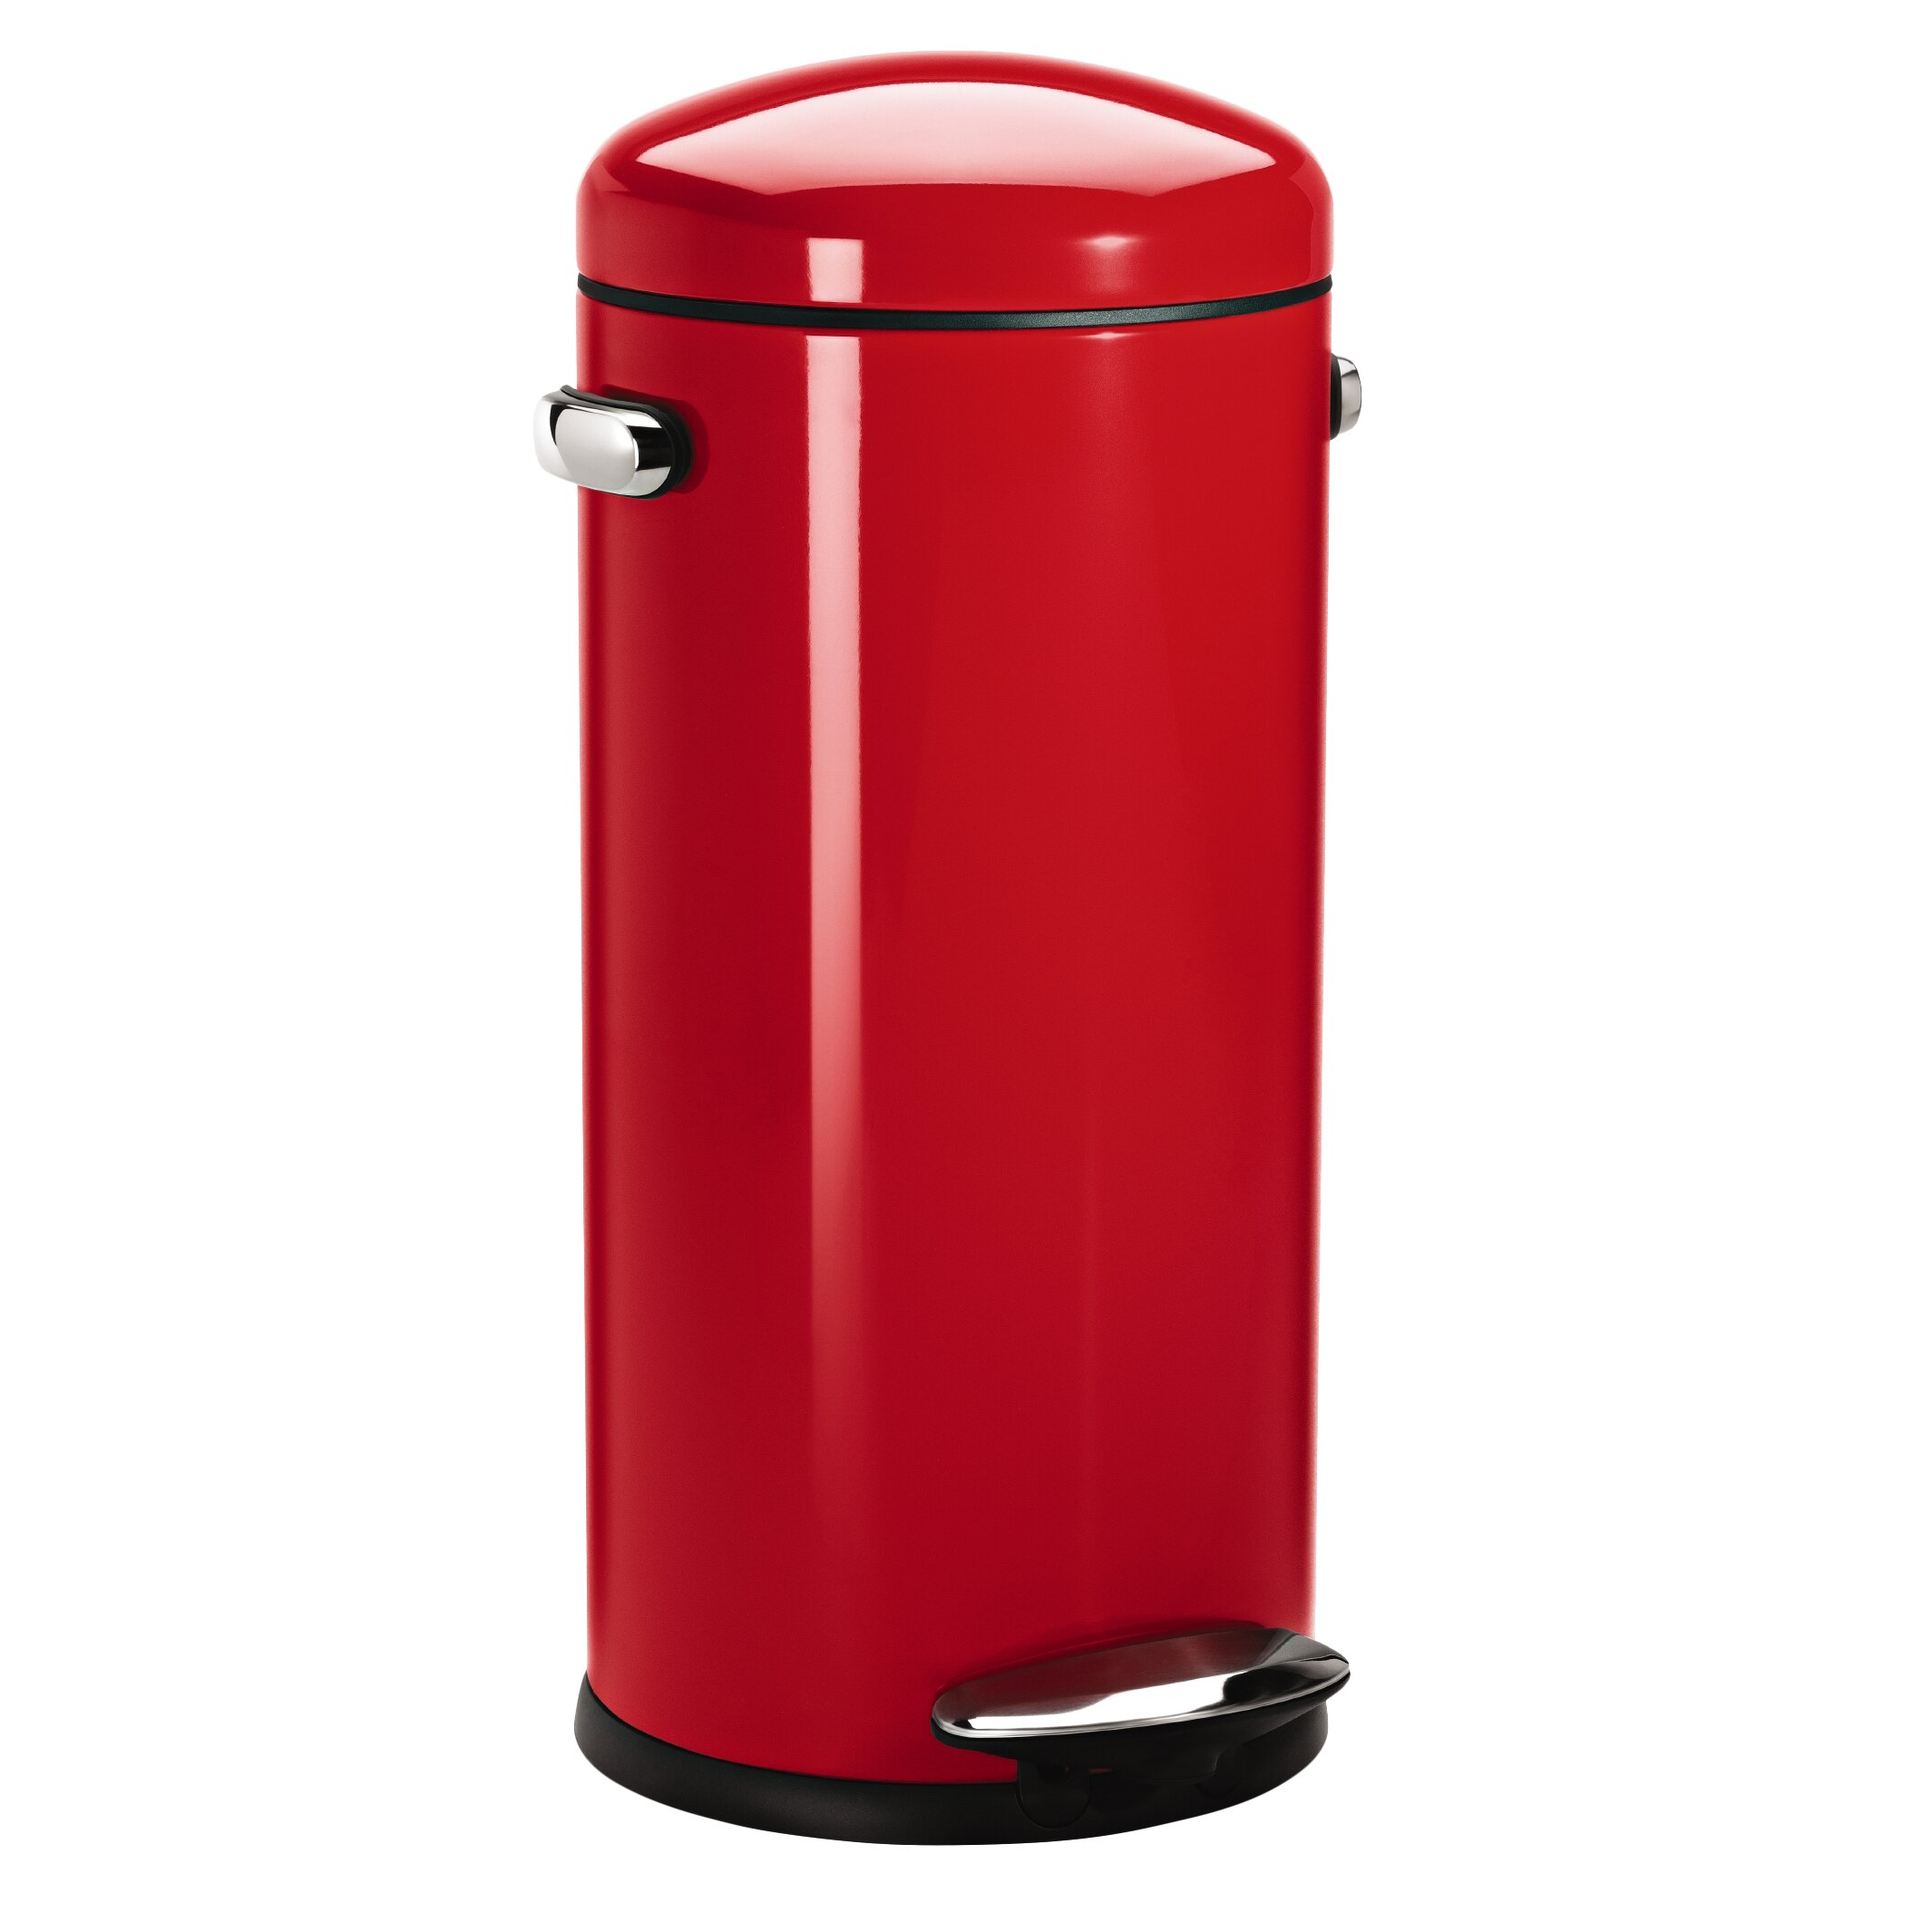 8 gallon round retro step trash can wayfair - Rd trash can for sale ...